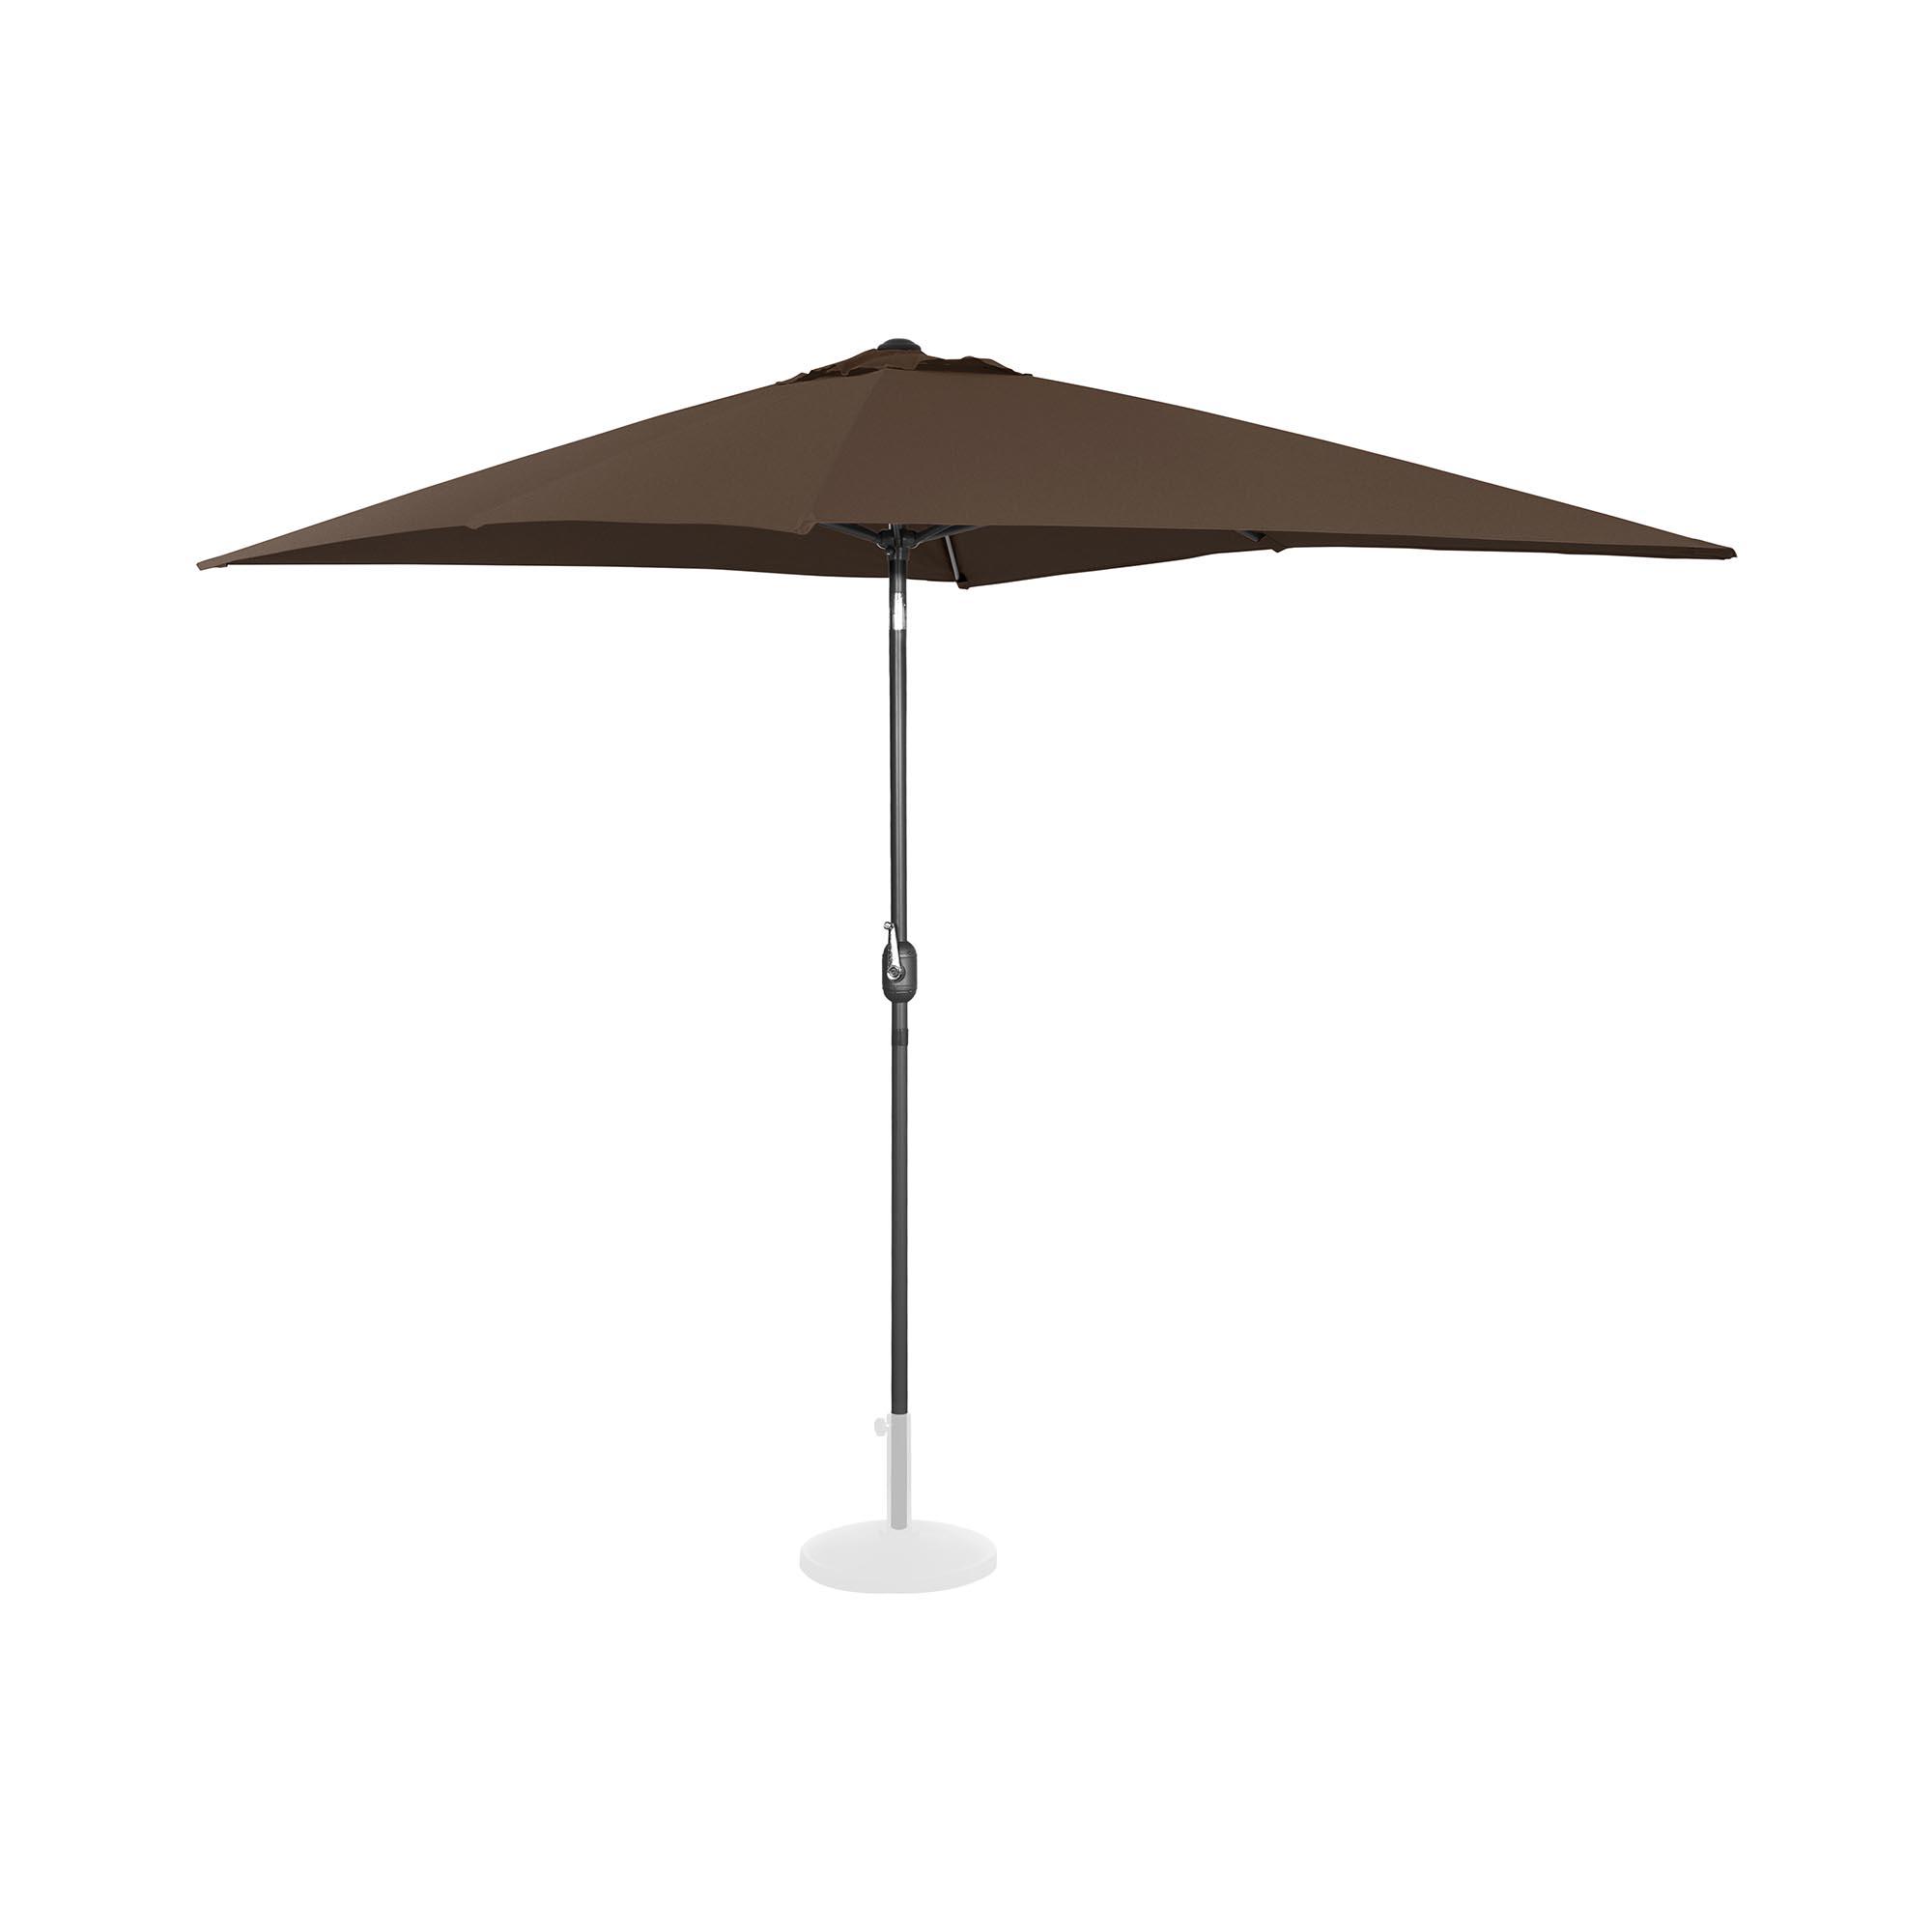 Uniprodo Sonnenschirm groß - braun - rechteckig - 200 x 300 cm - neigbar 10250138